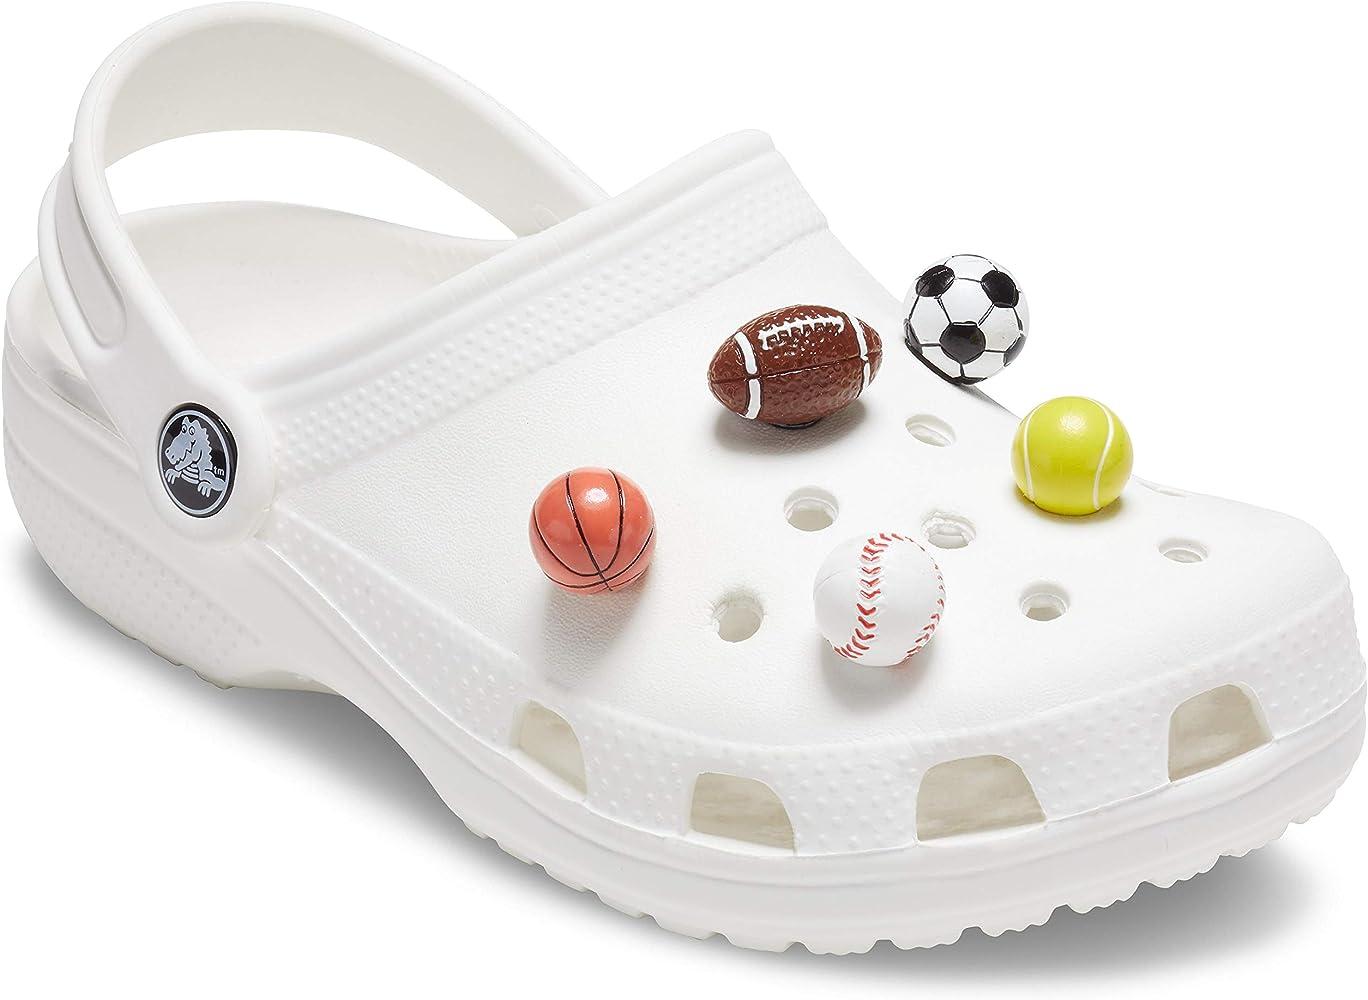 Amazon.com: Crocs Shoe Charms 5-Pack